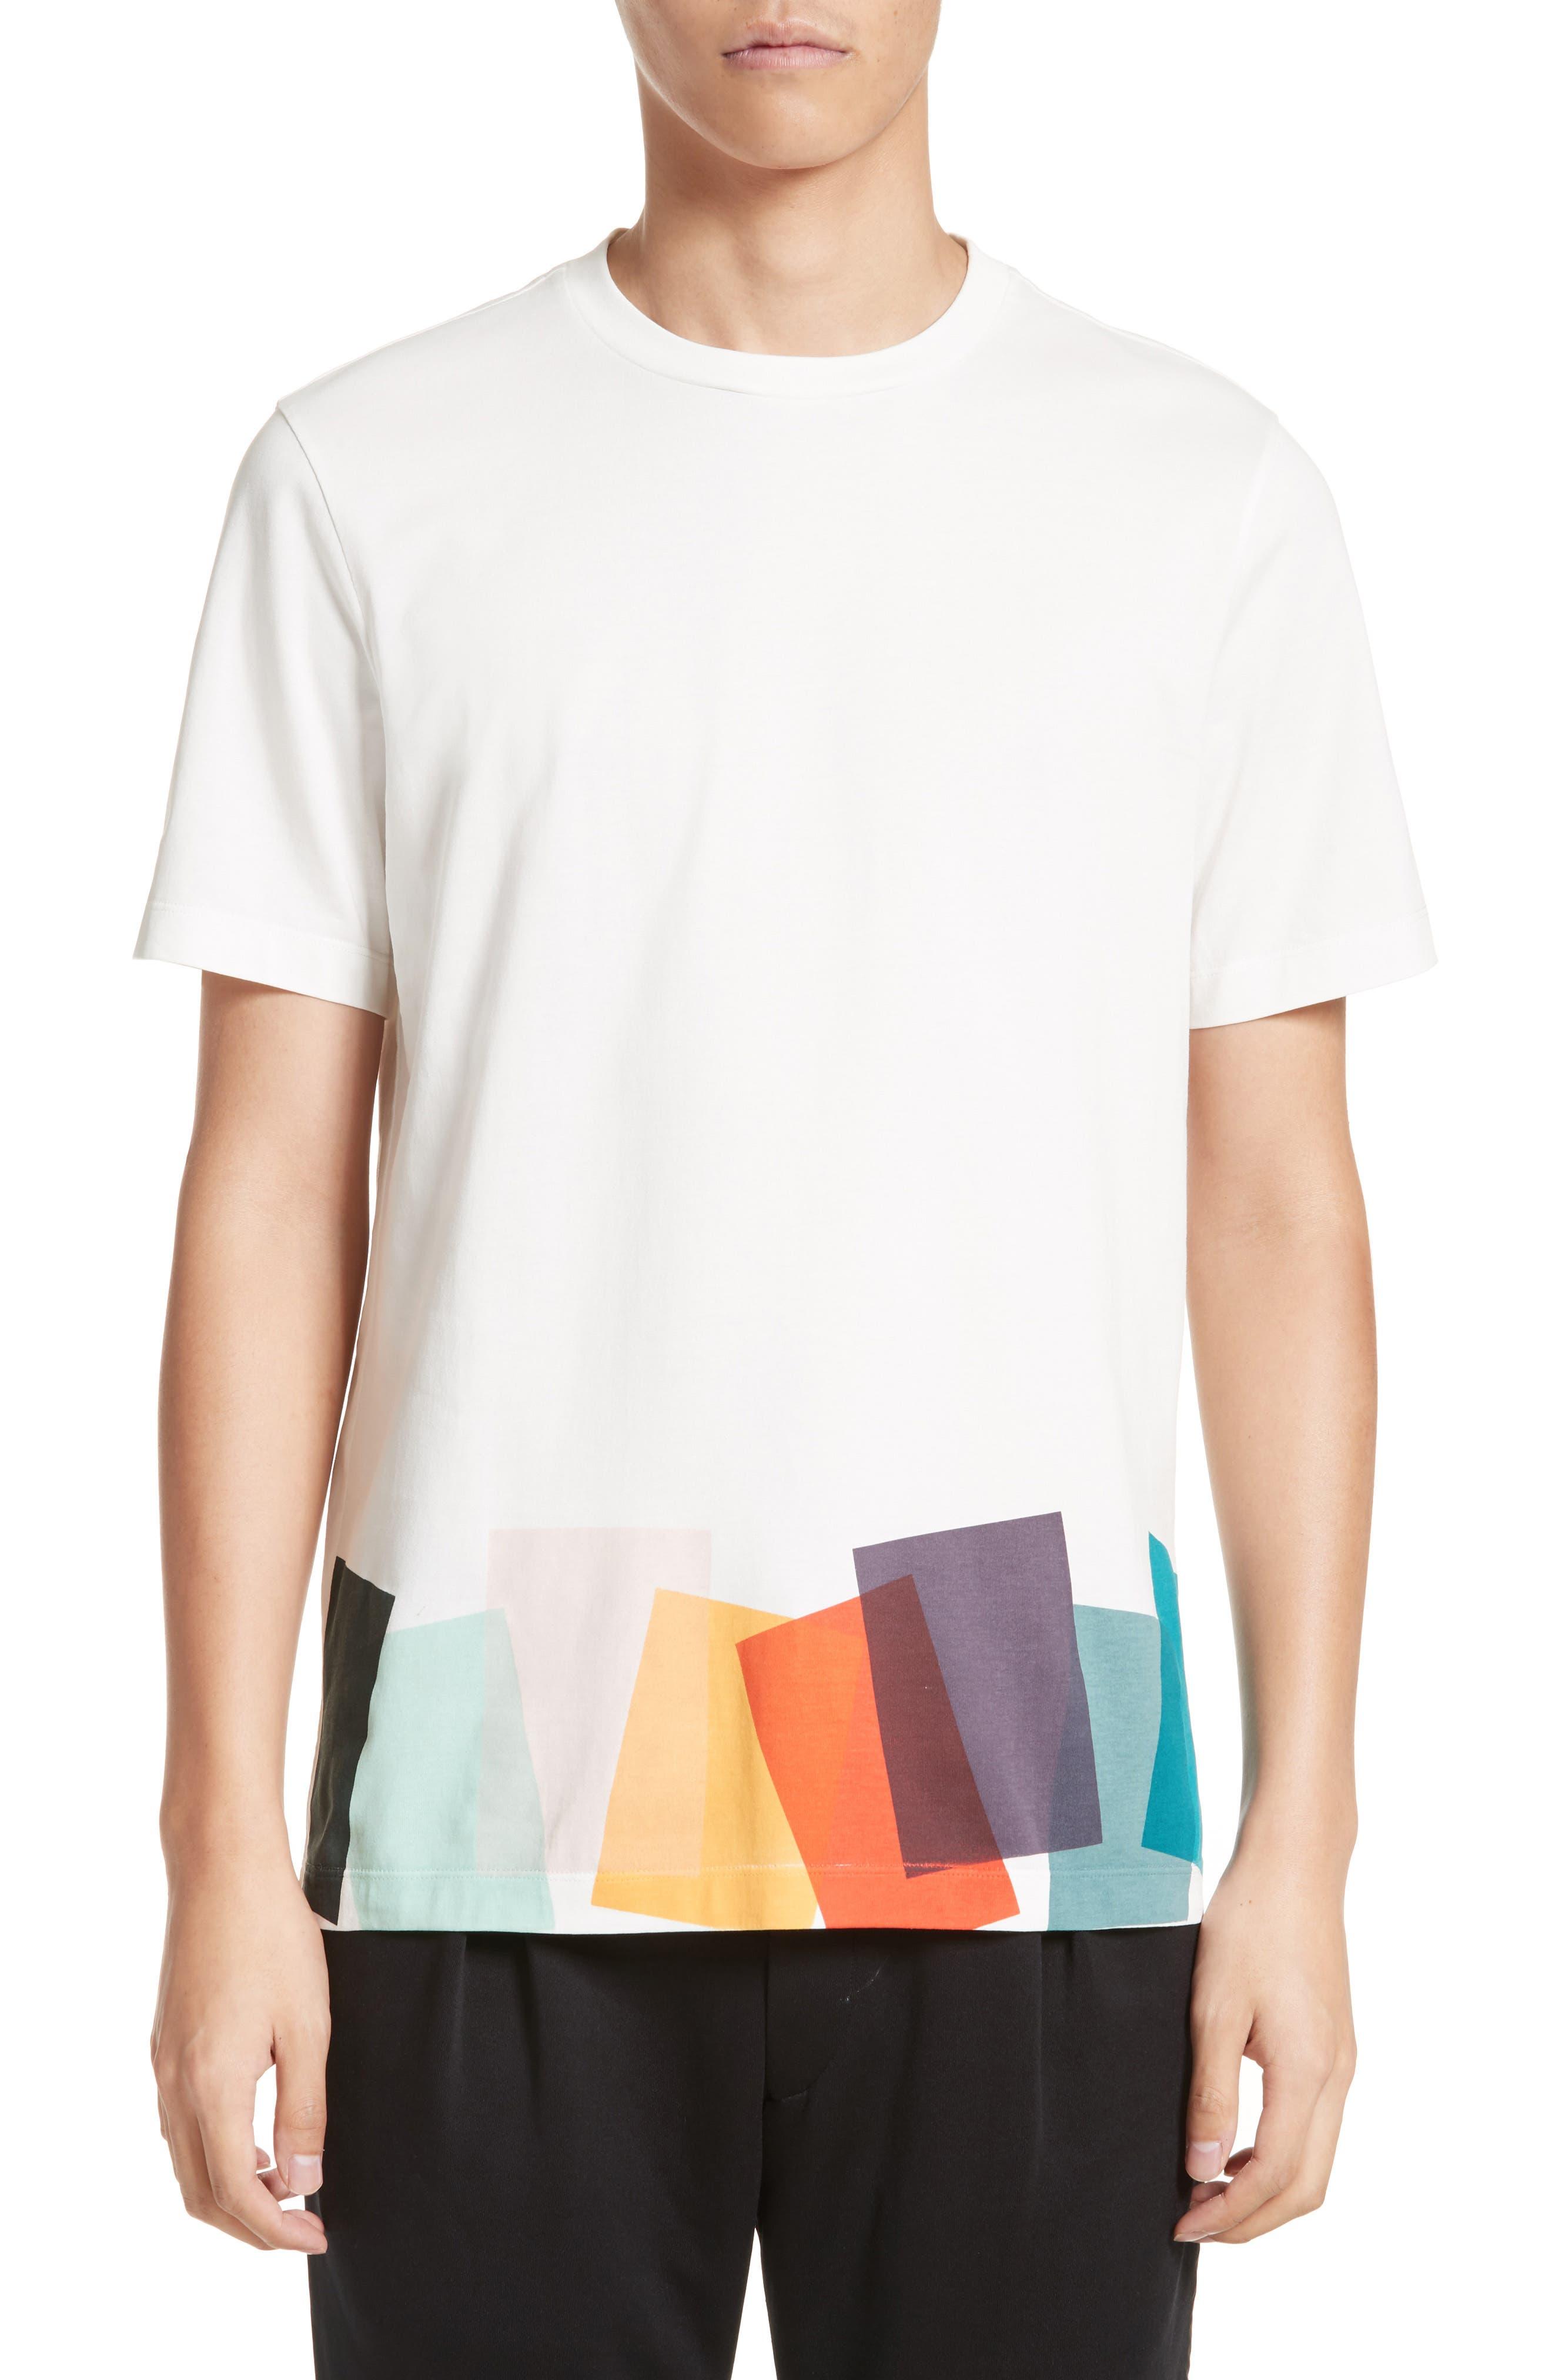 Alternate Image 1 Selected - Paul Smith Colorblock Print T-shirt